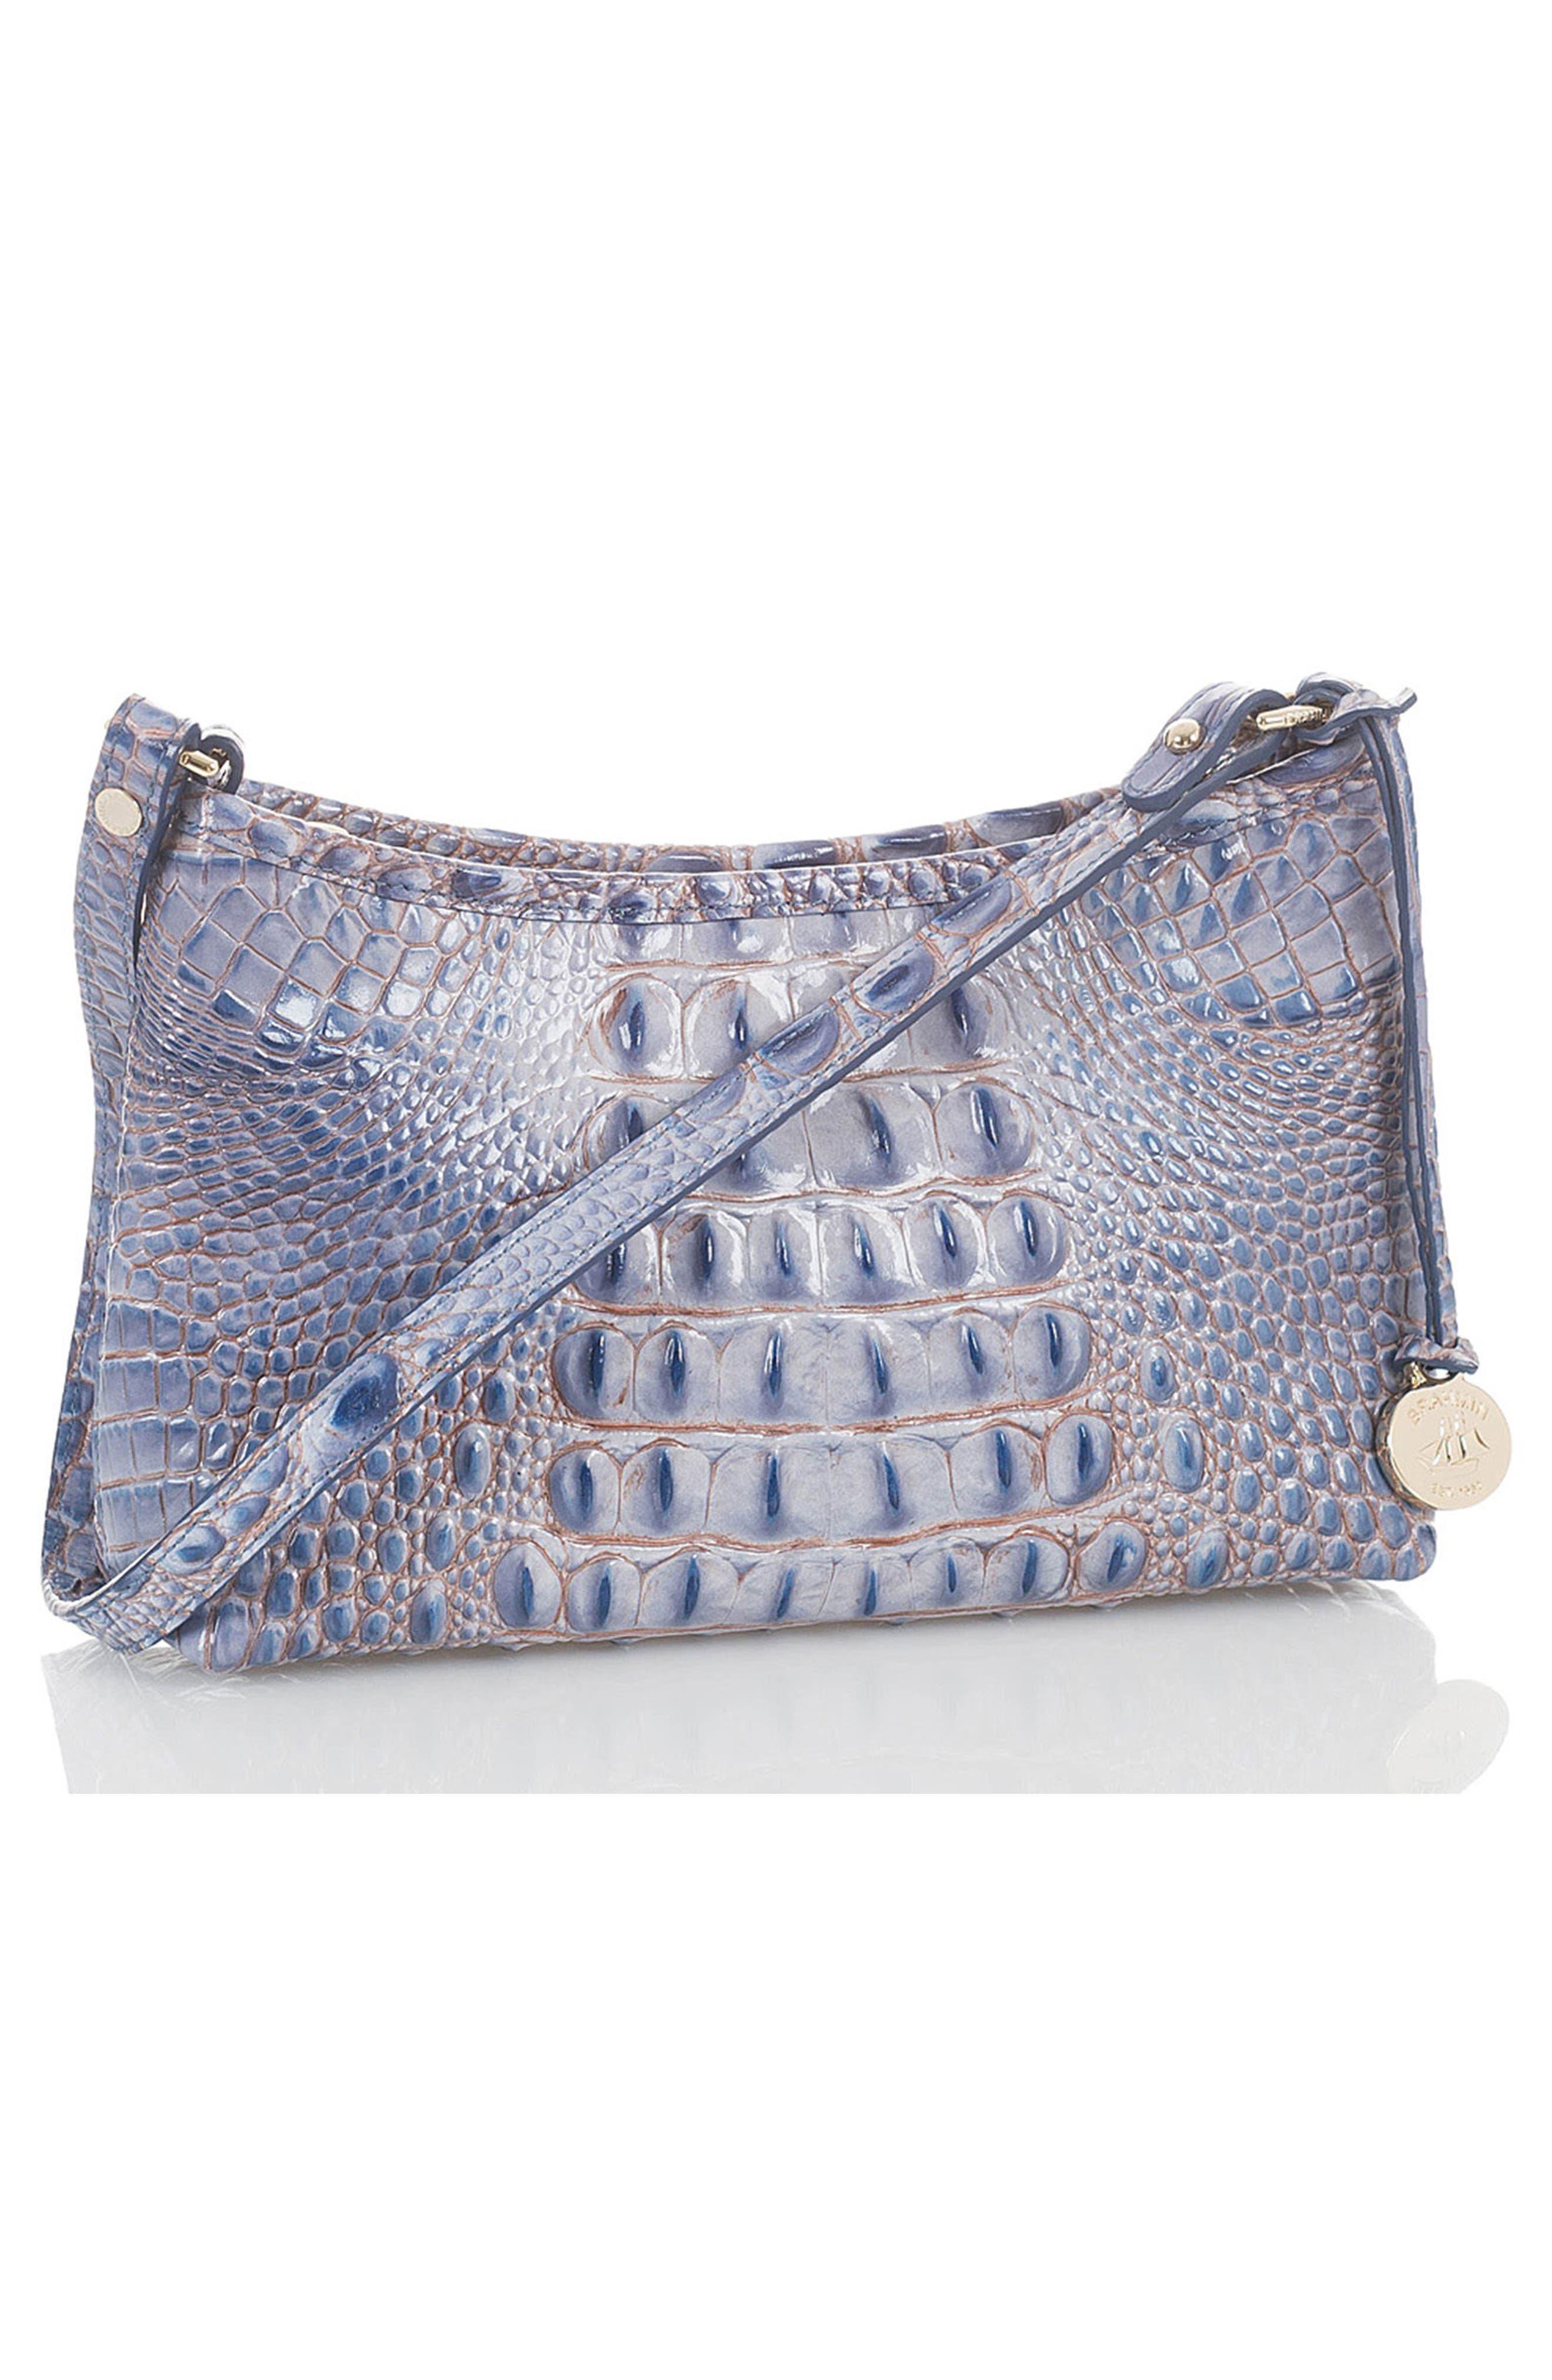 'Anytime - Mini' Convertible Handbag,                             Alternate thumbnail 59, color,